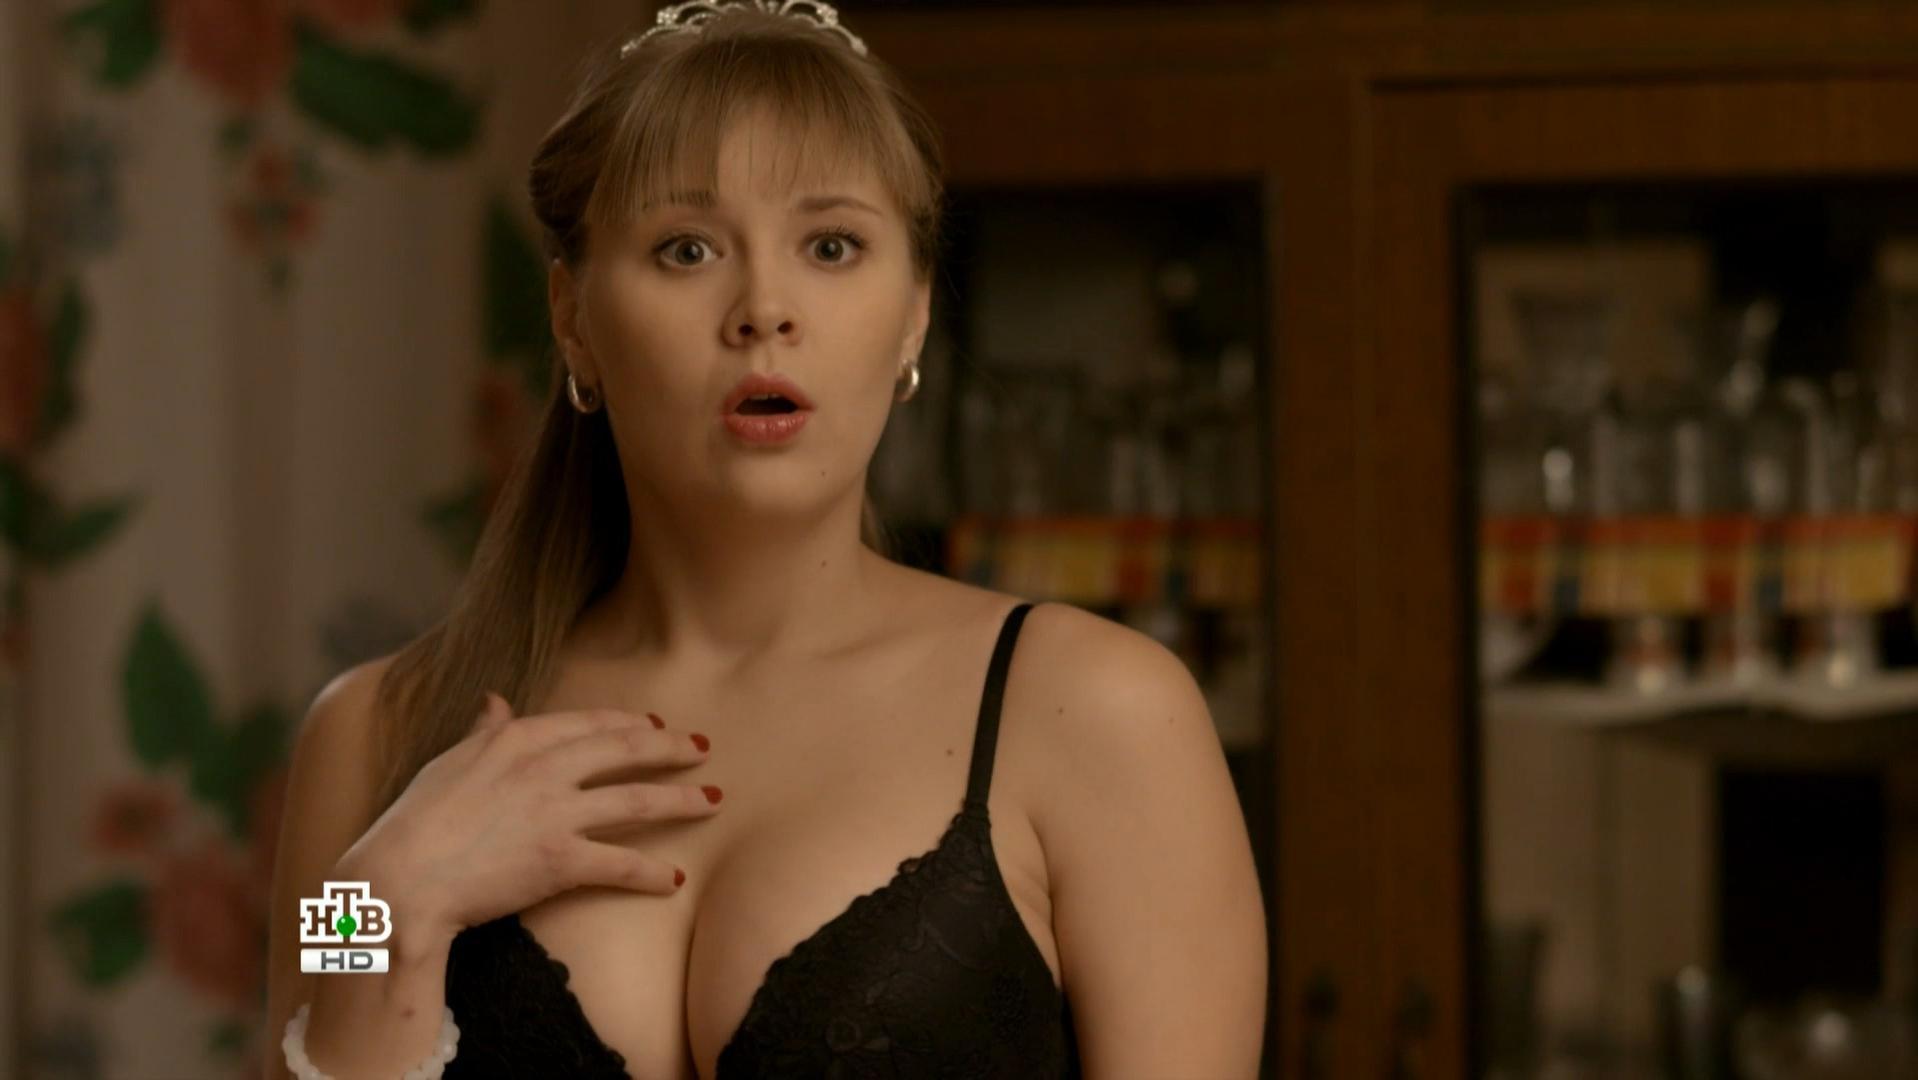 Viktoriya Romanenko sexy - Pensilvanija s01e12-13 (2016)